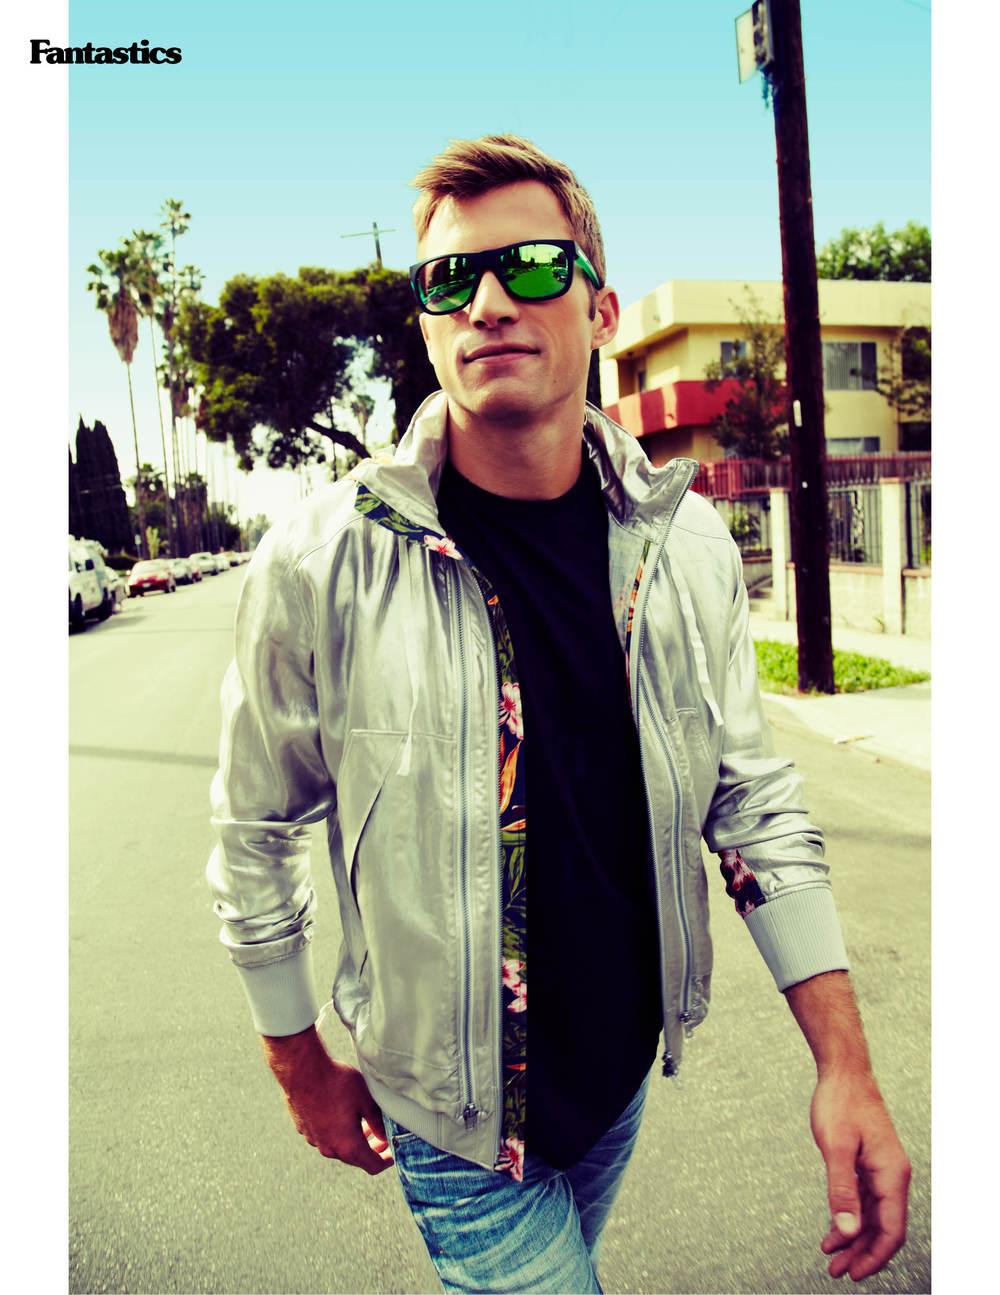 08_Fantastics-Justin-Deeley8.jpg